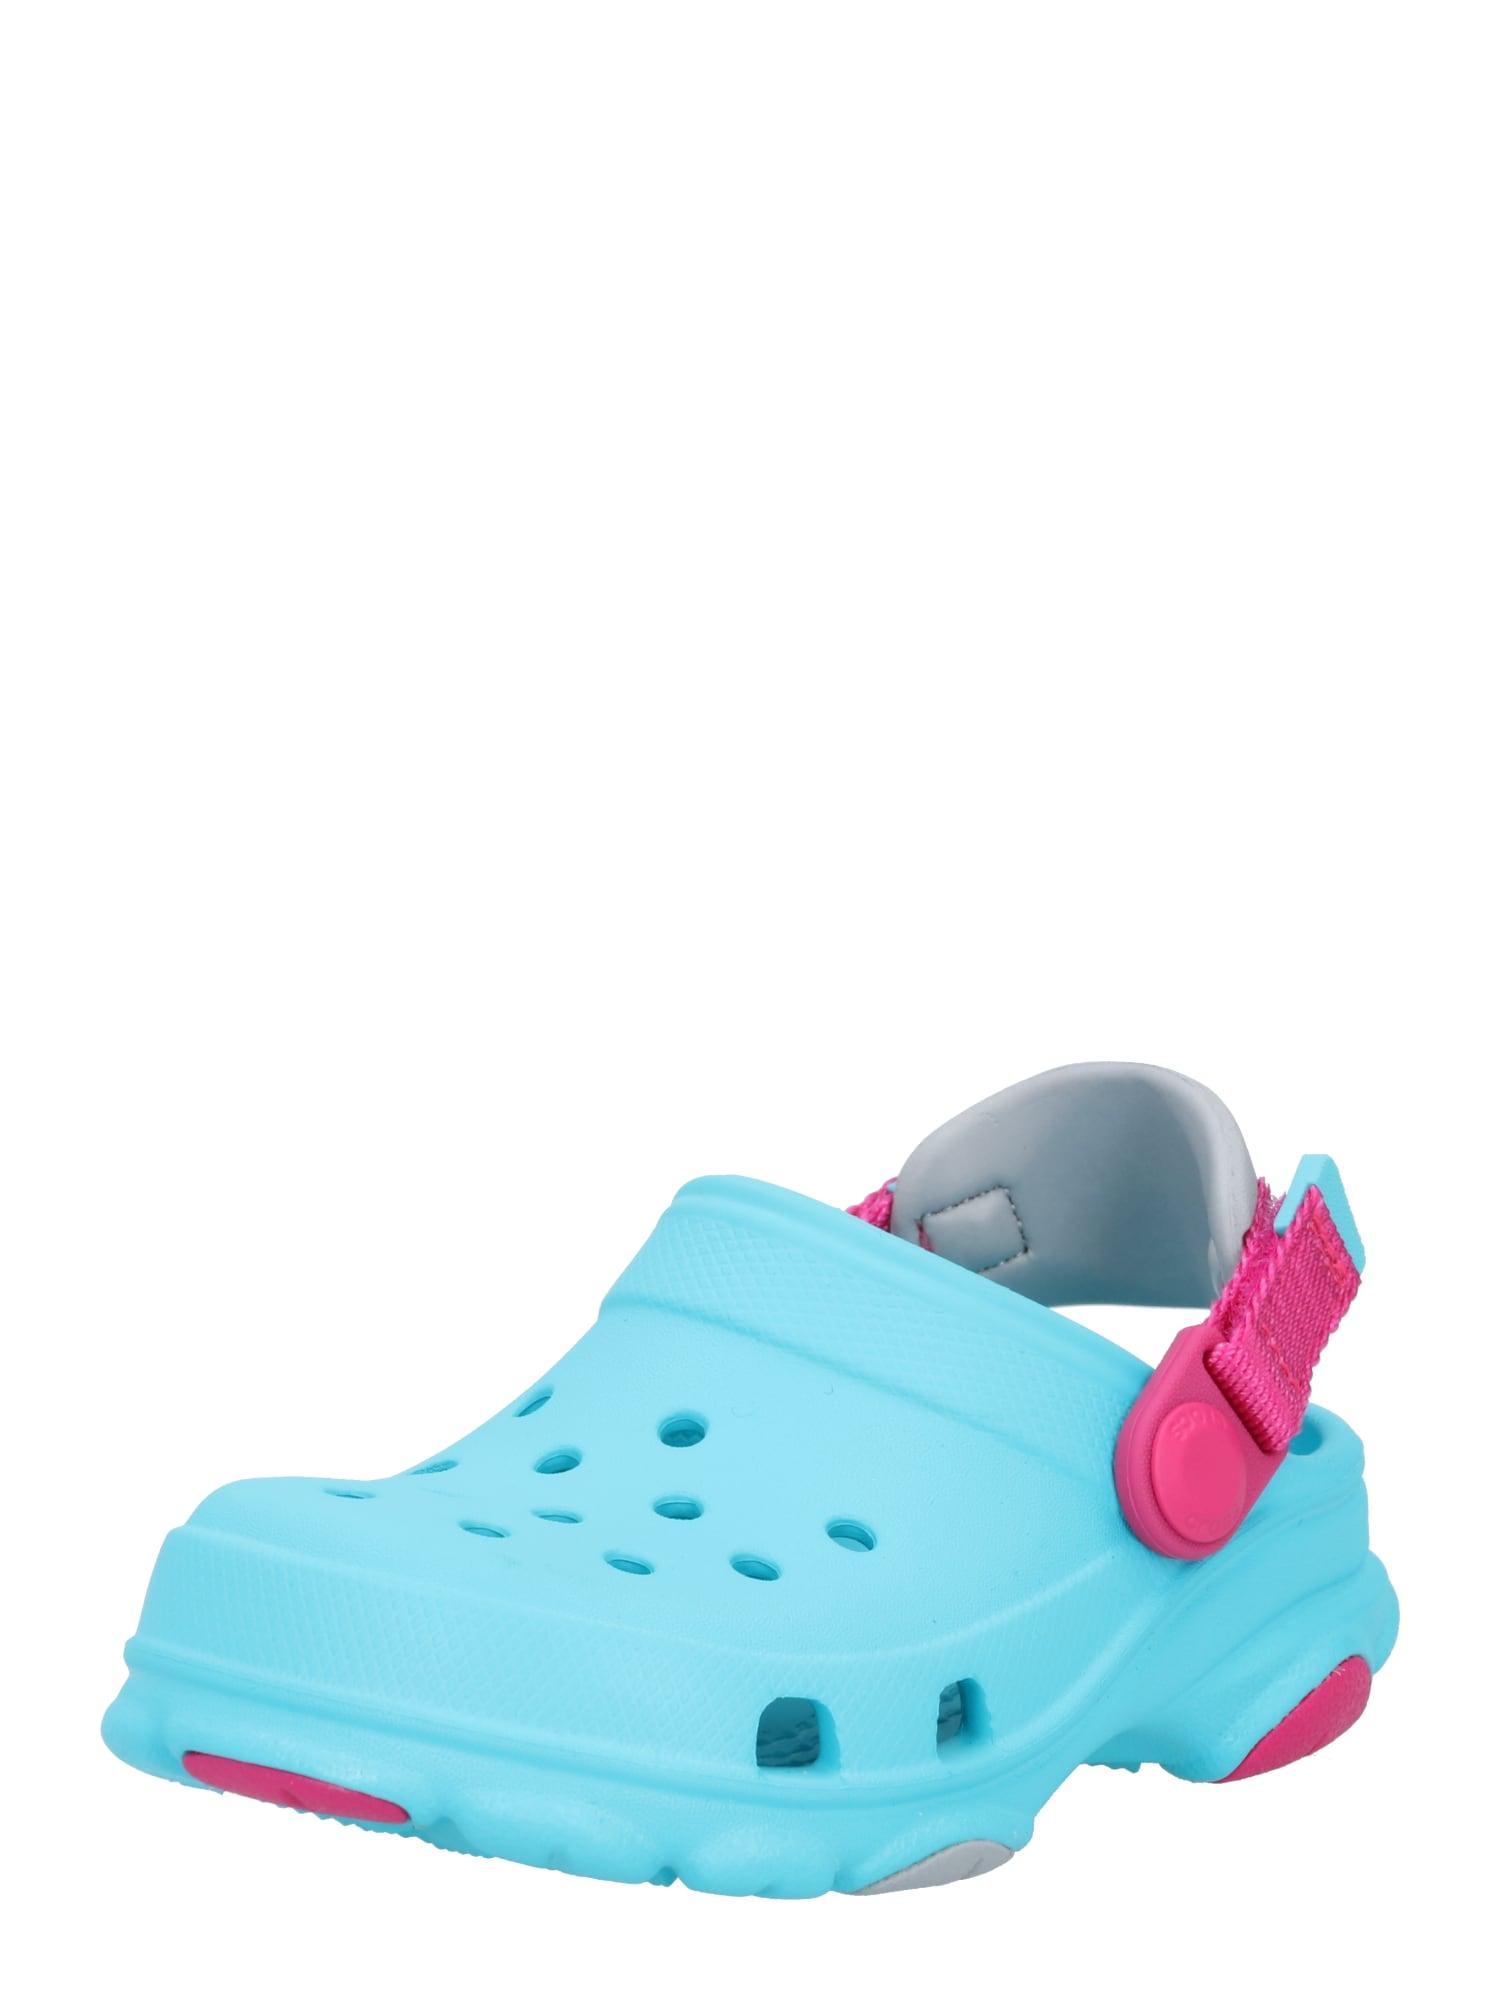 Crocs Atviri batai vandens spalva / uogų spalva